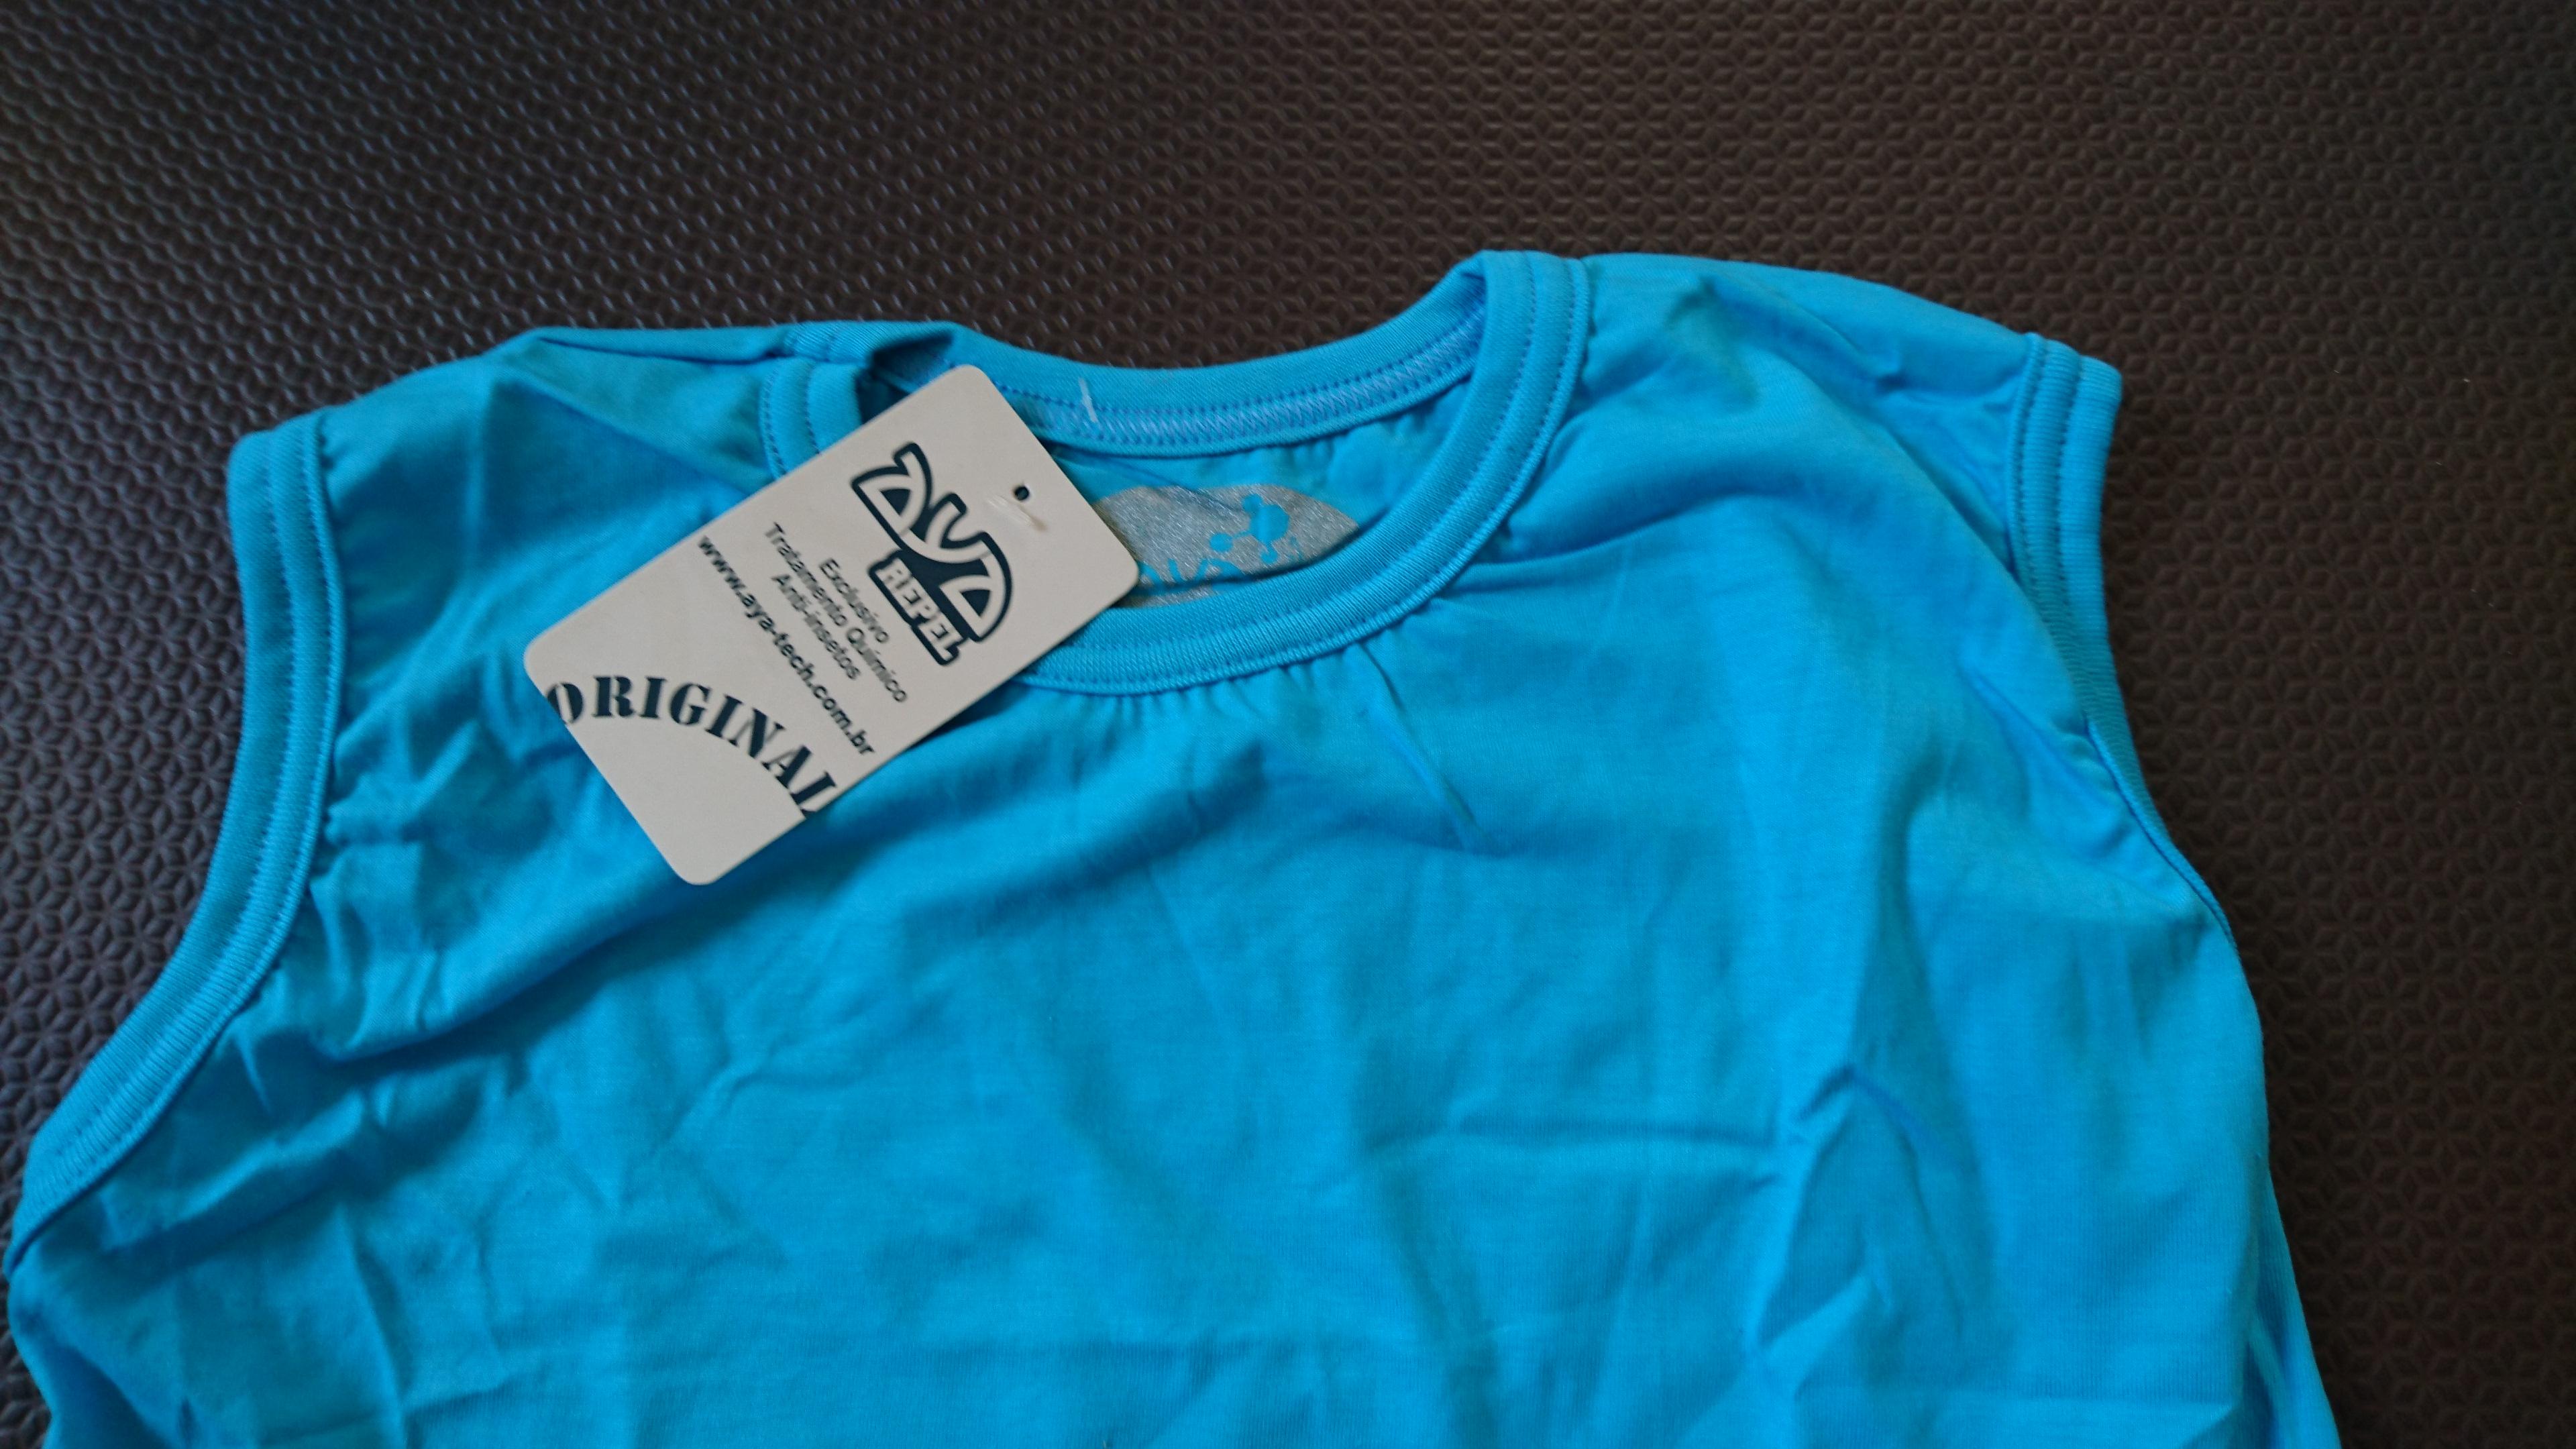 48124ad91297f Camiseta Repelente Aya Repel Regata Infantil Azul Piscina 12 anos sem  estampa